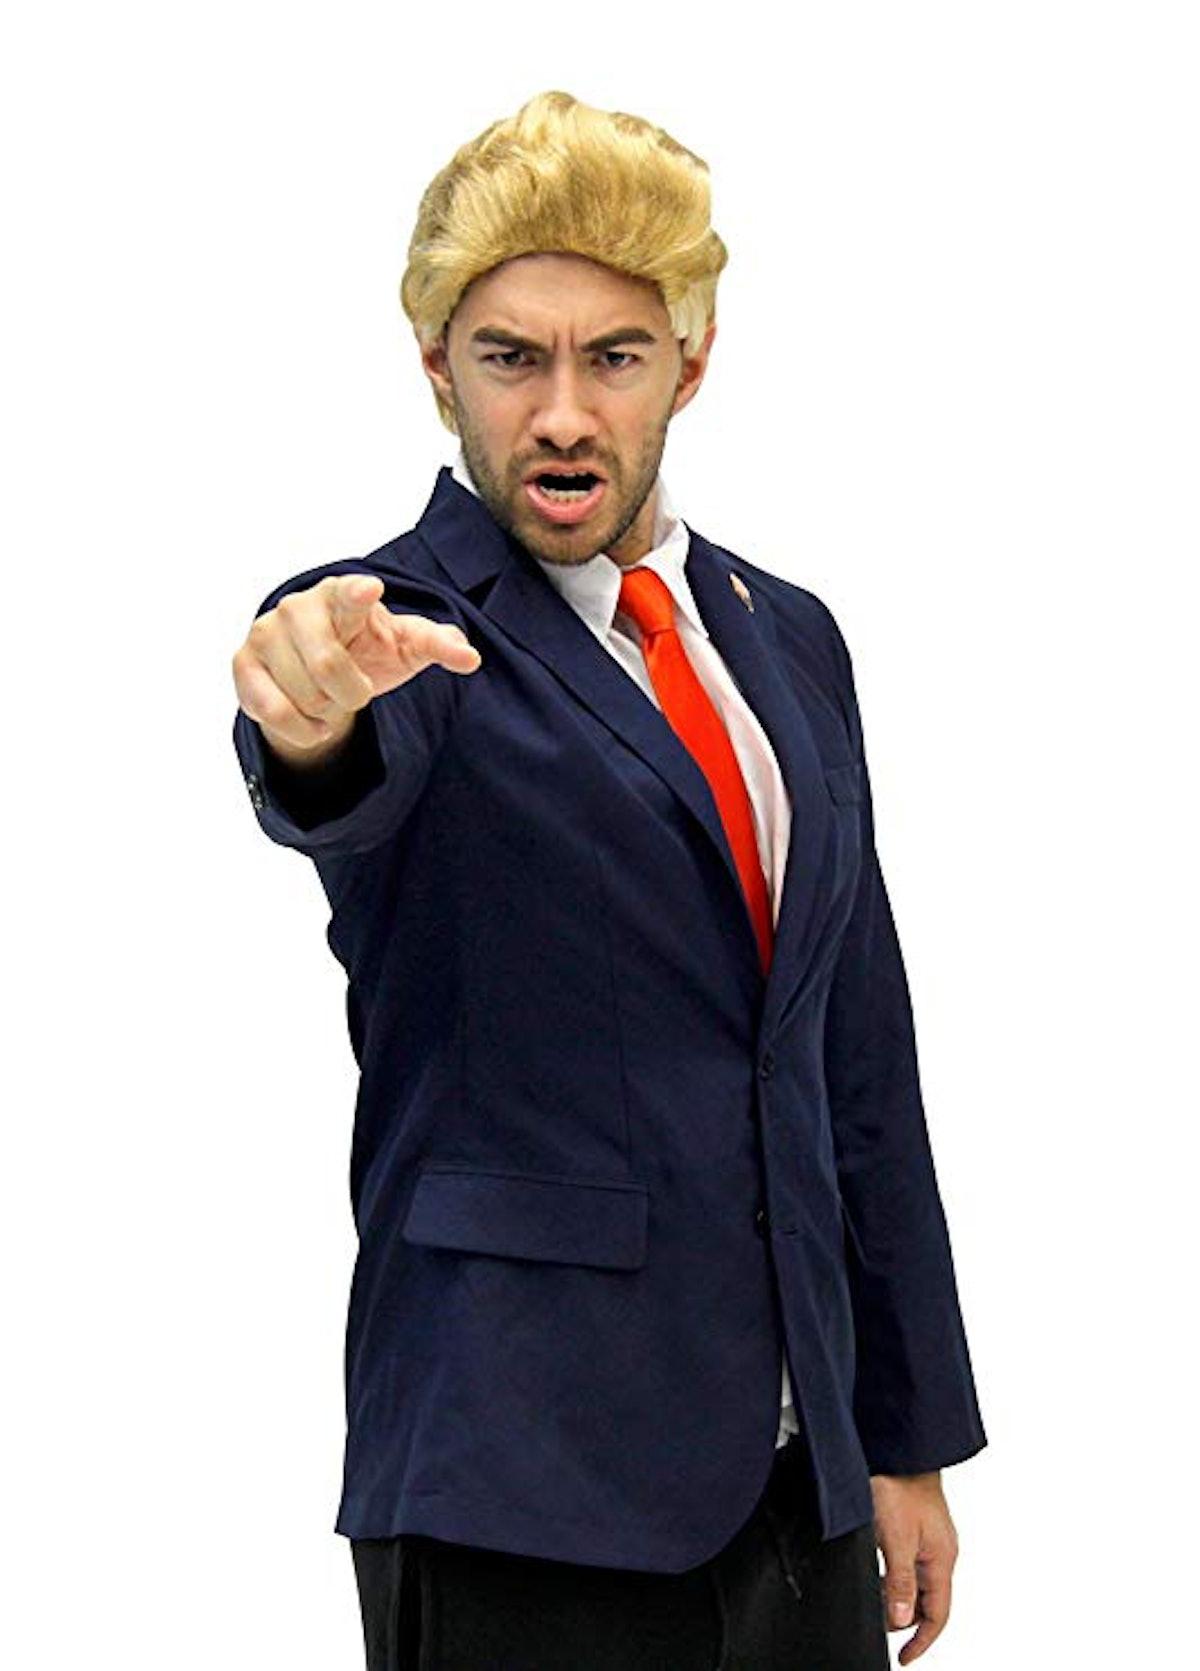 Costume Agent Men's Trump Costume Jacket